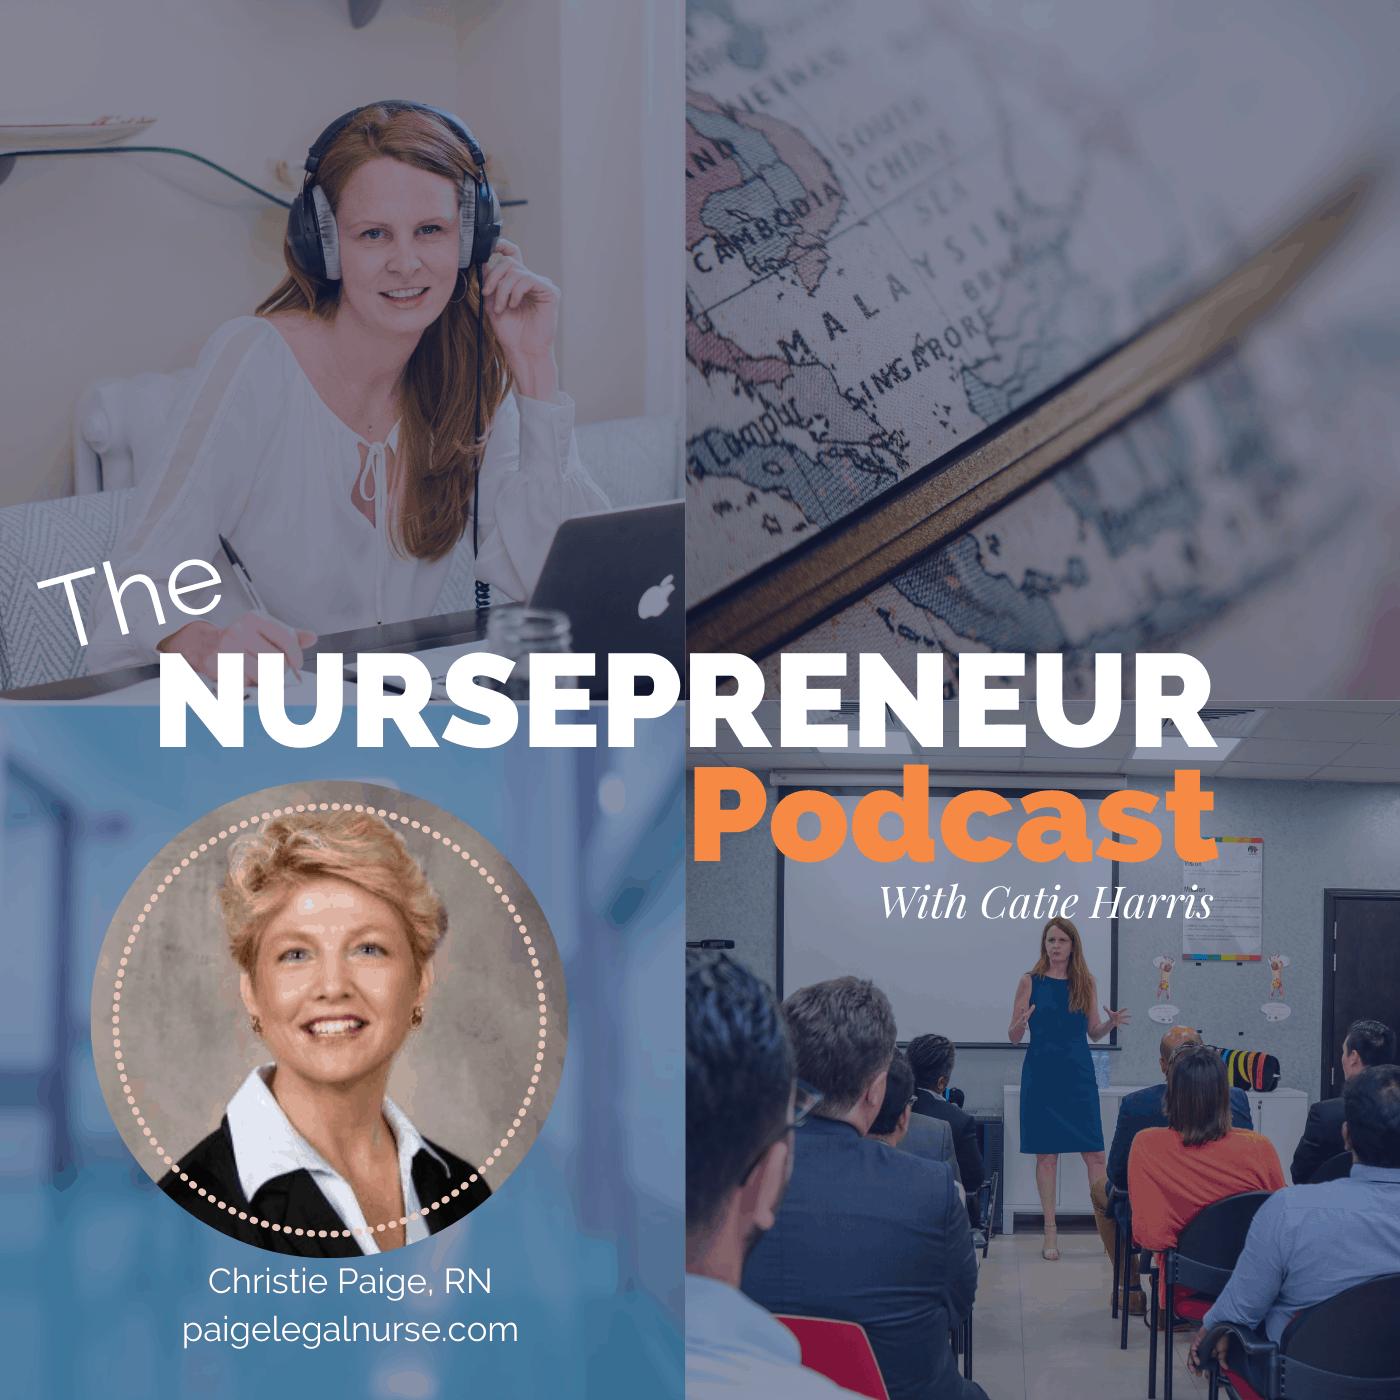 Are Marketing Materials a Waste of Money? NursePreneur Podcast